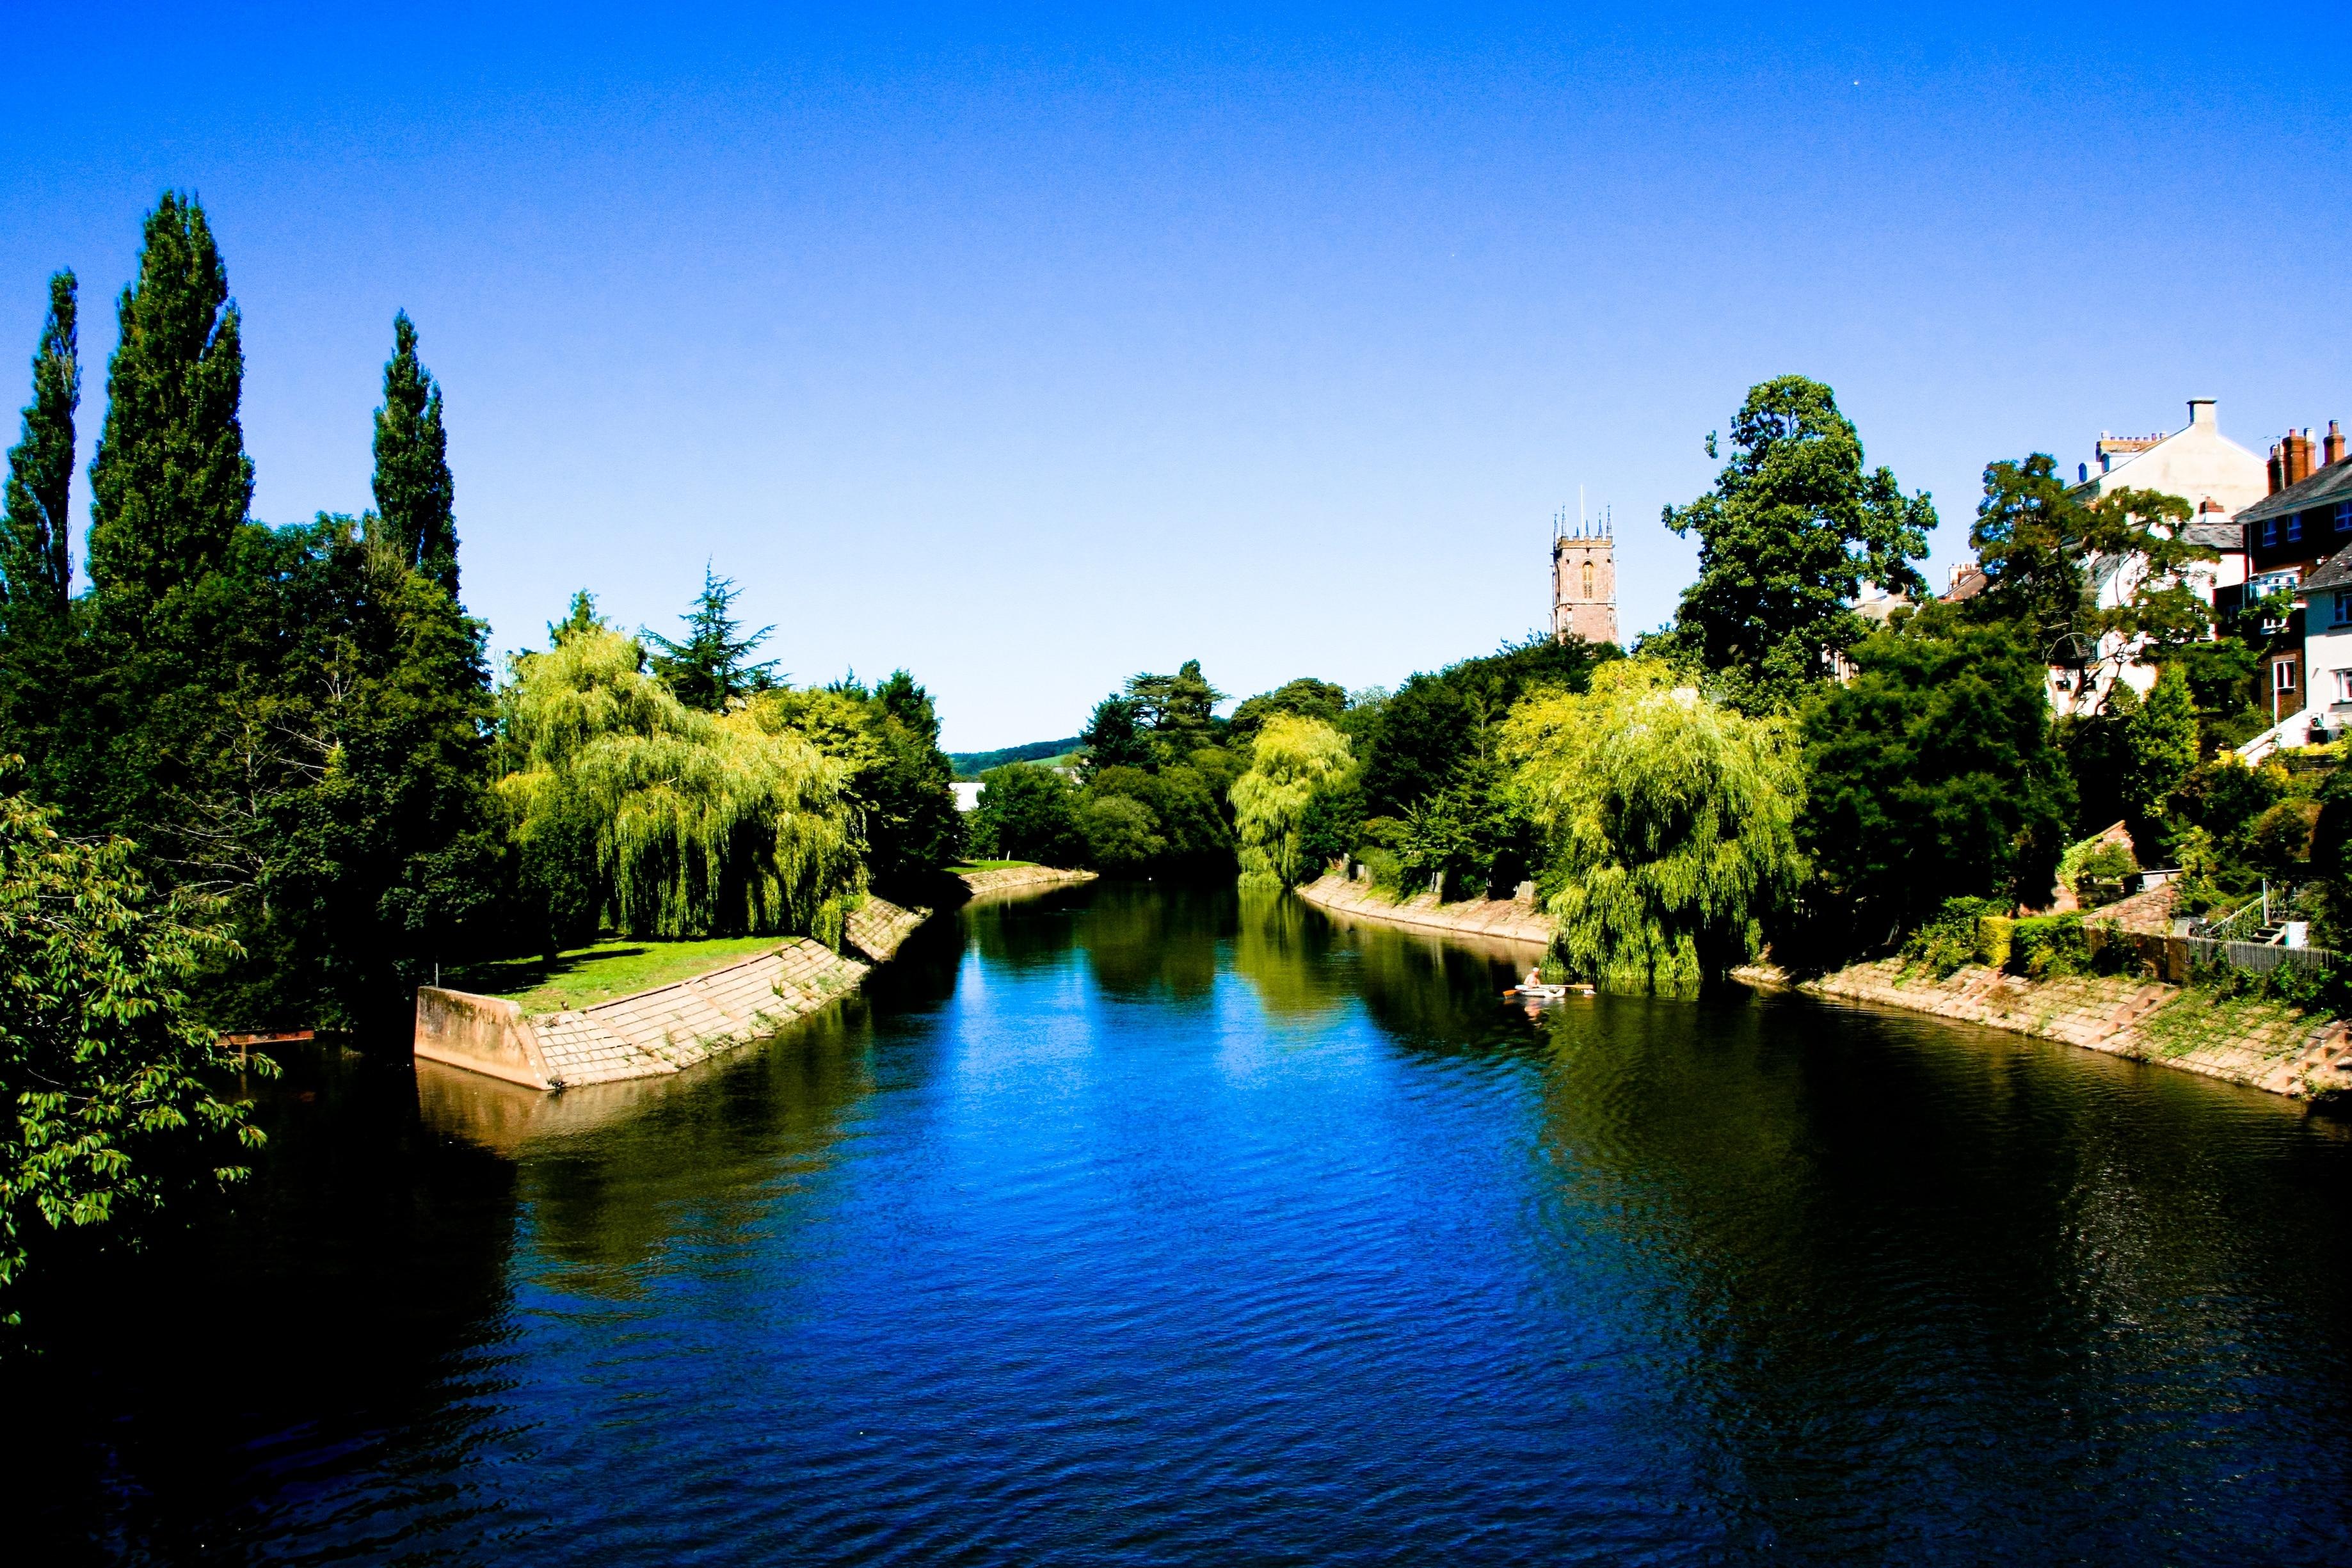 Tiverton, England, United Kingdom